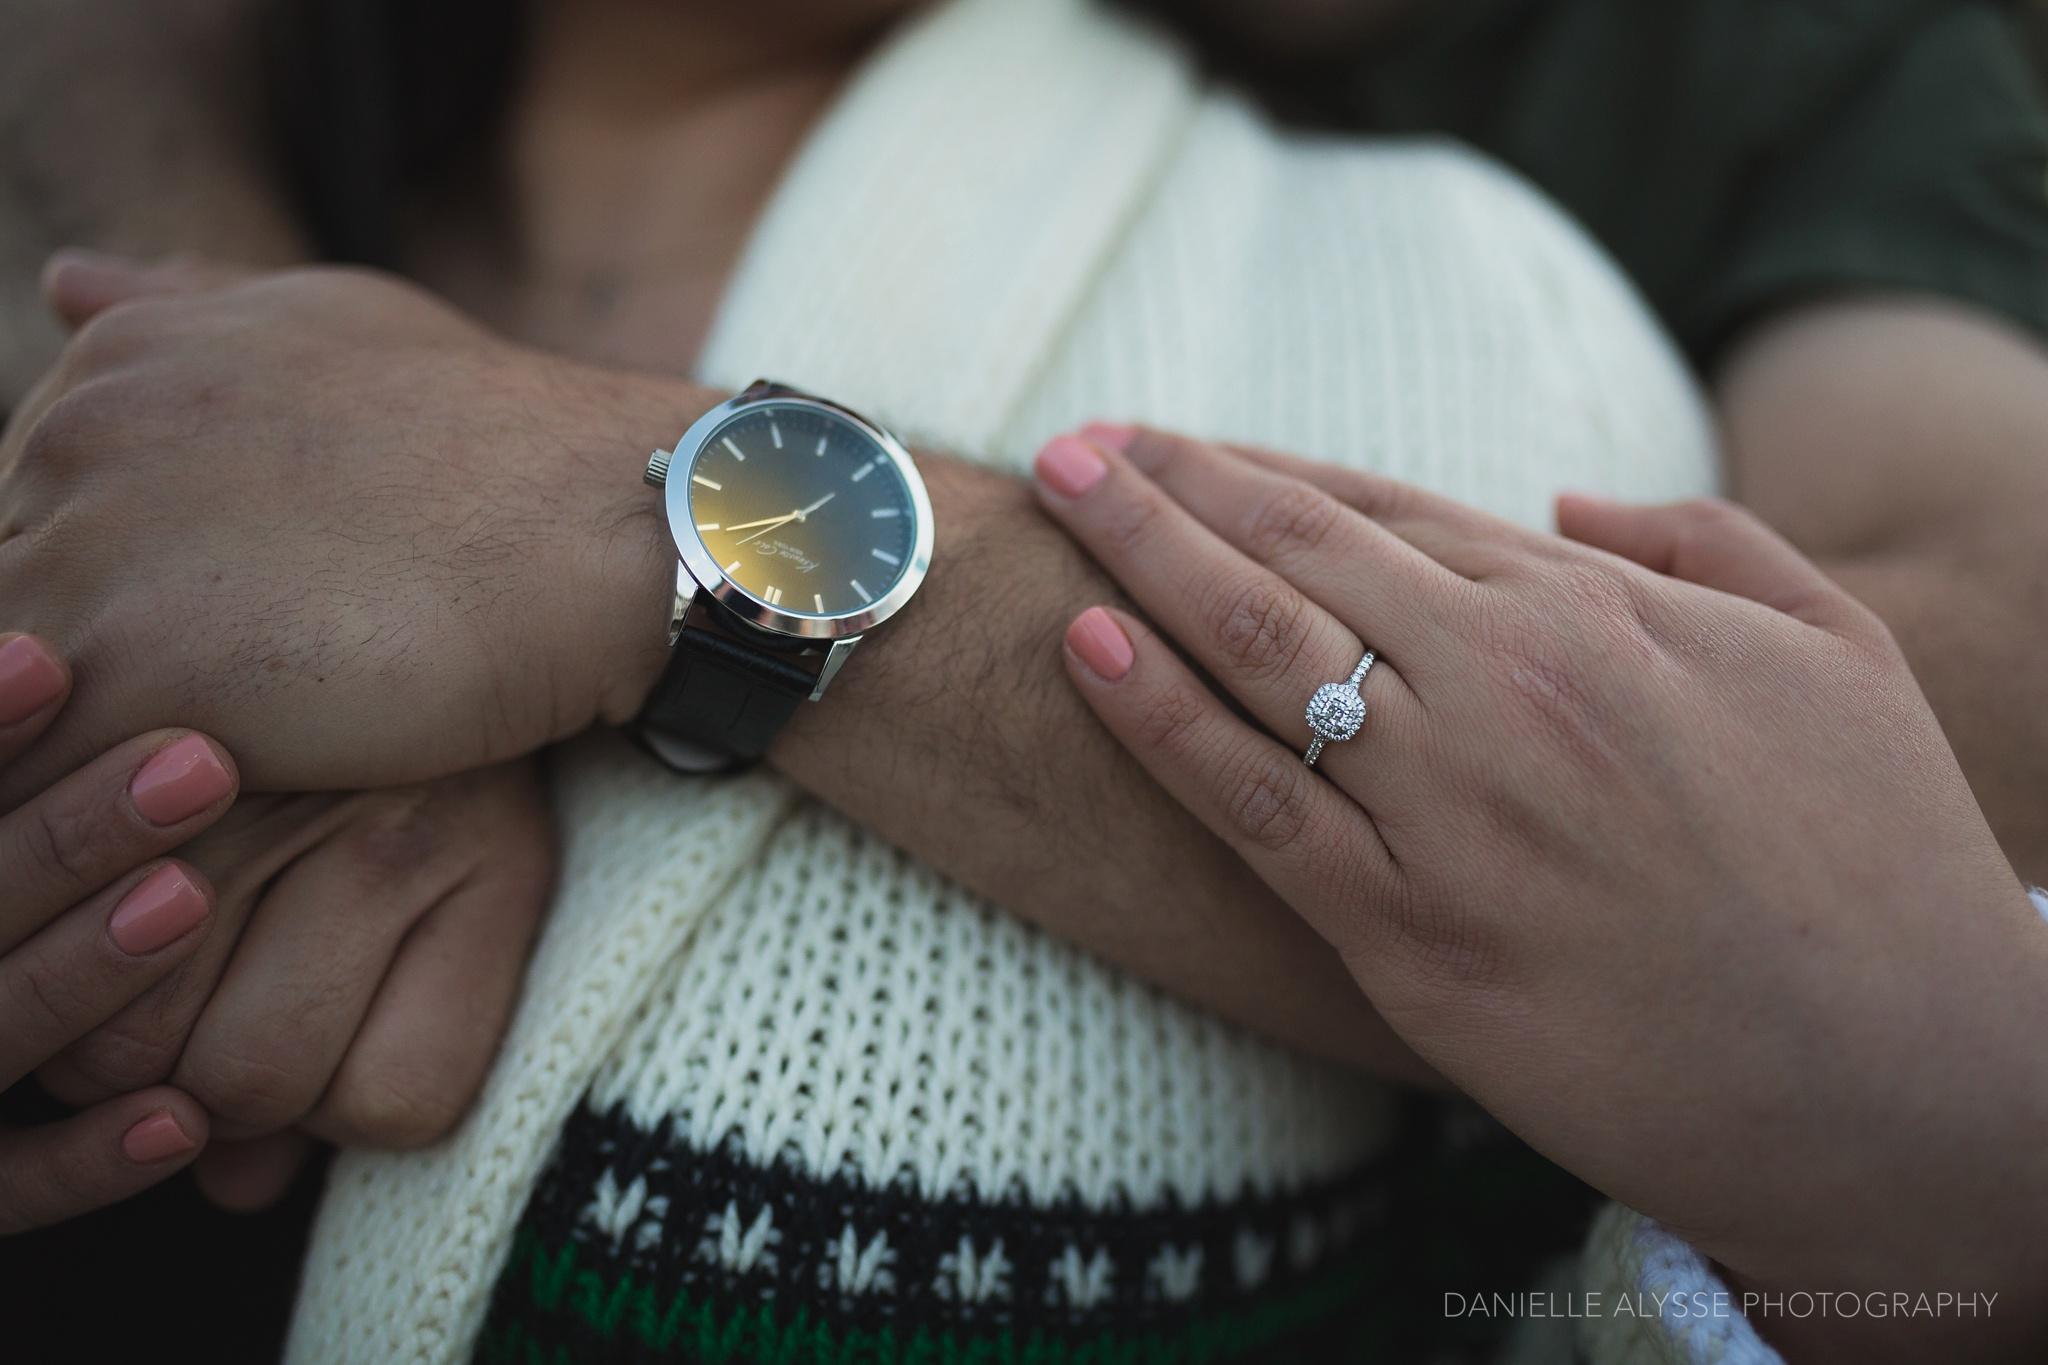 180324_engagement_lily_danielle_alysse_photography_downtown_sacramento_wedding_photographer_blog_61_WEB.jpg